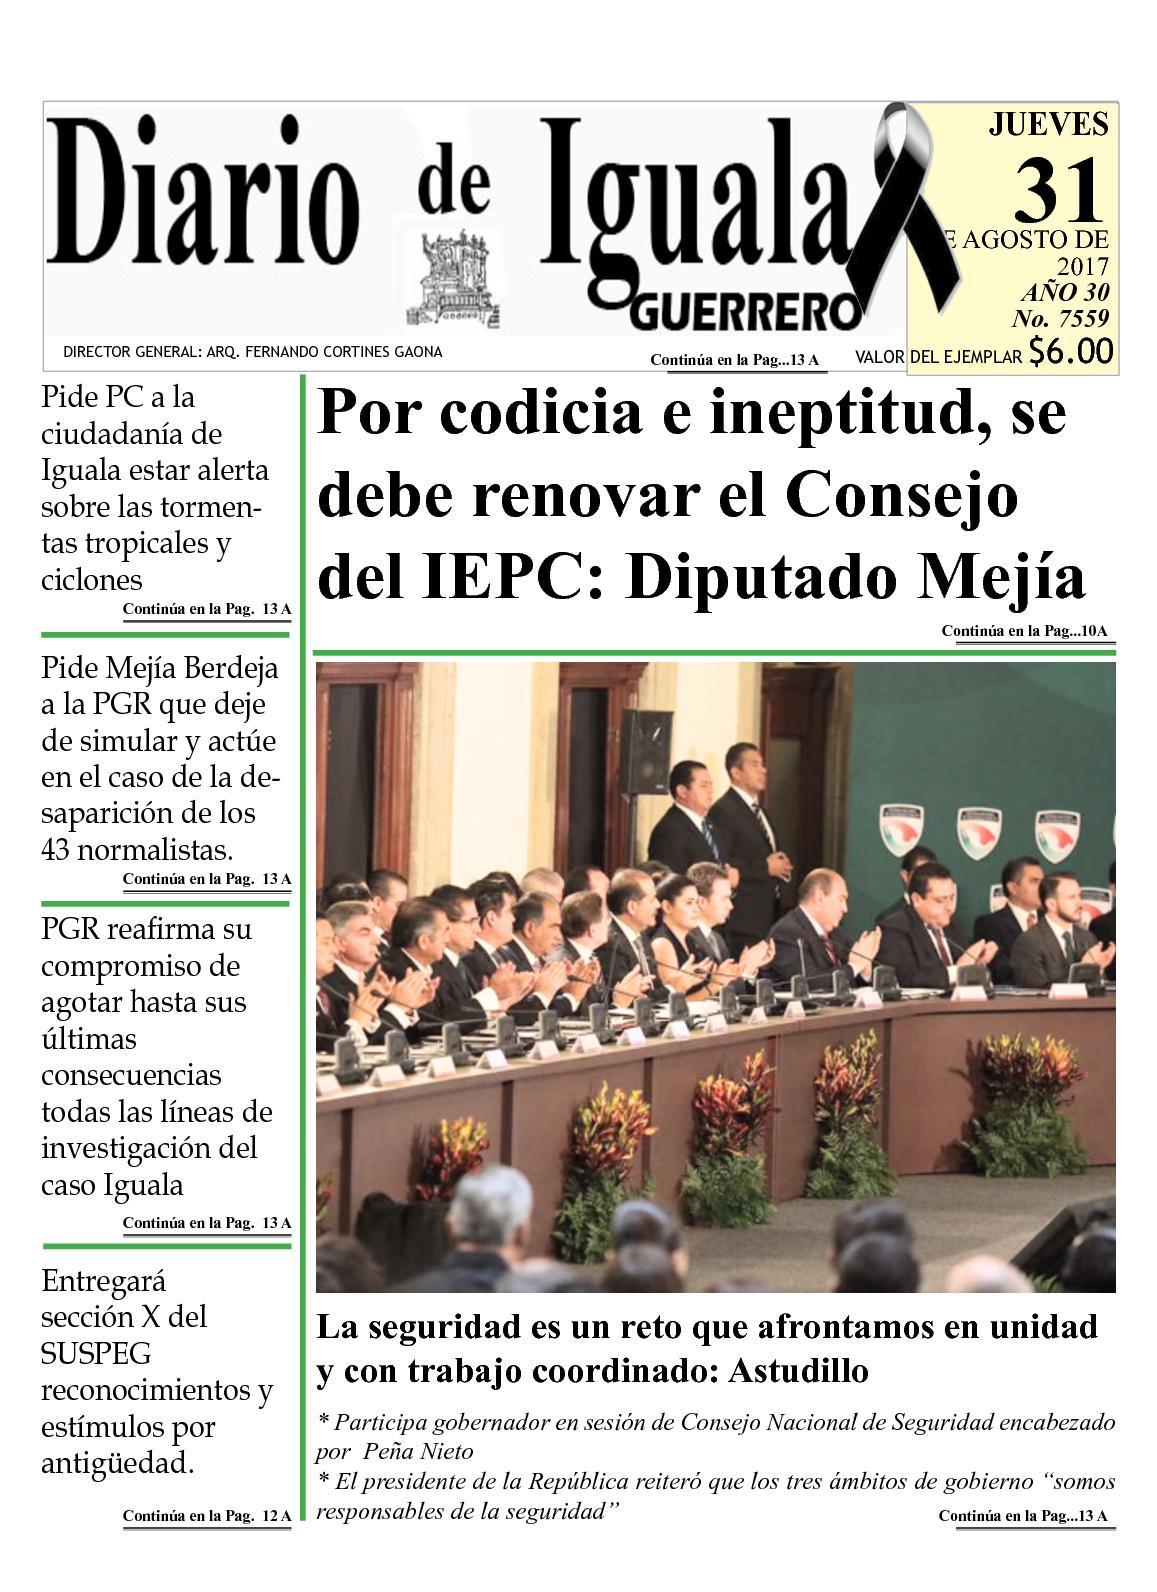 Diario De Iguala Jueves 31 De Agosto De 2017